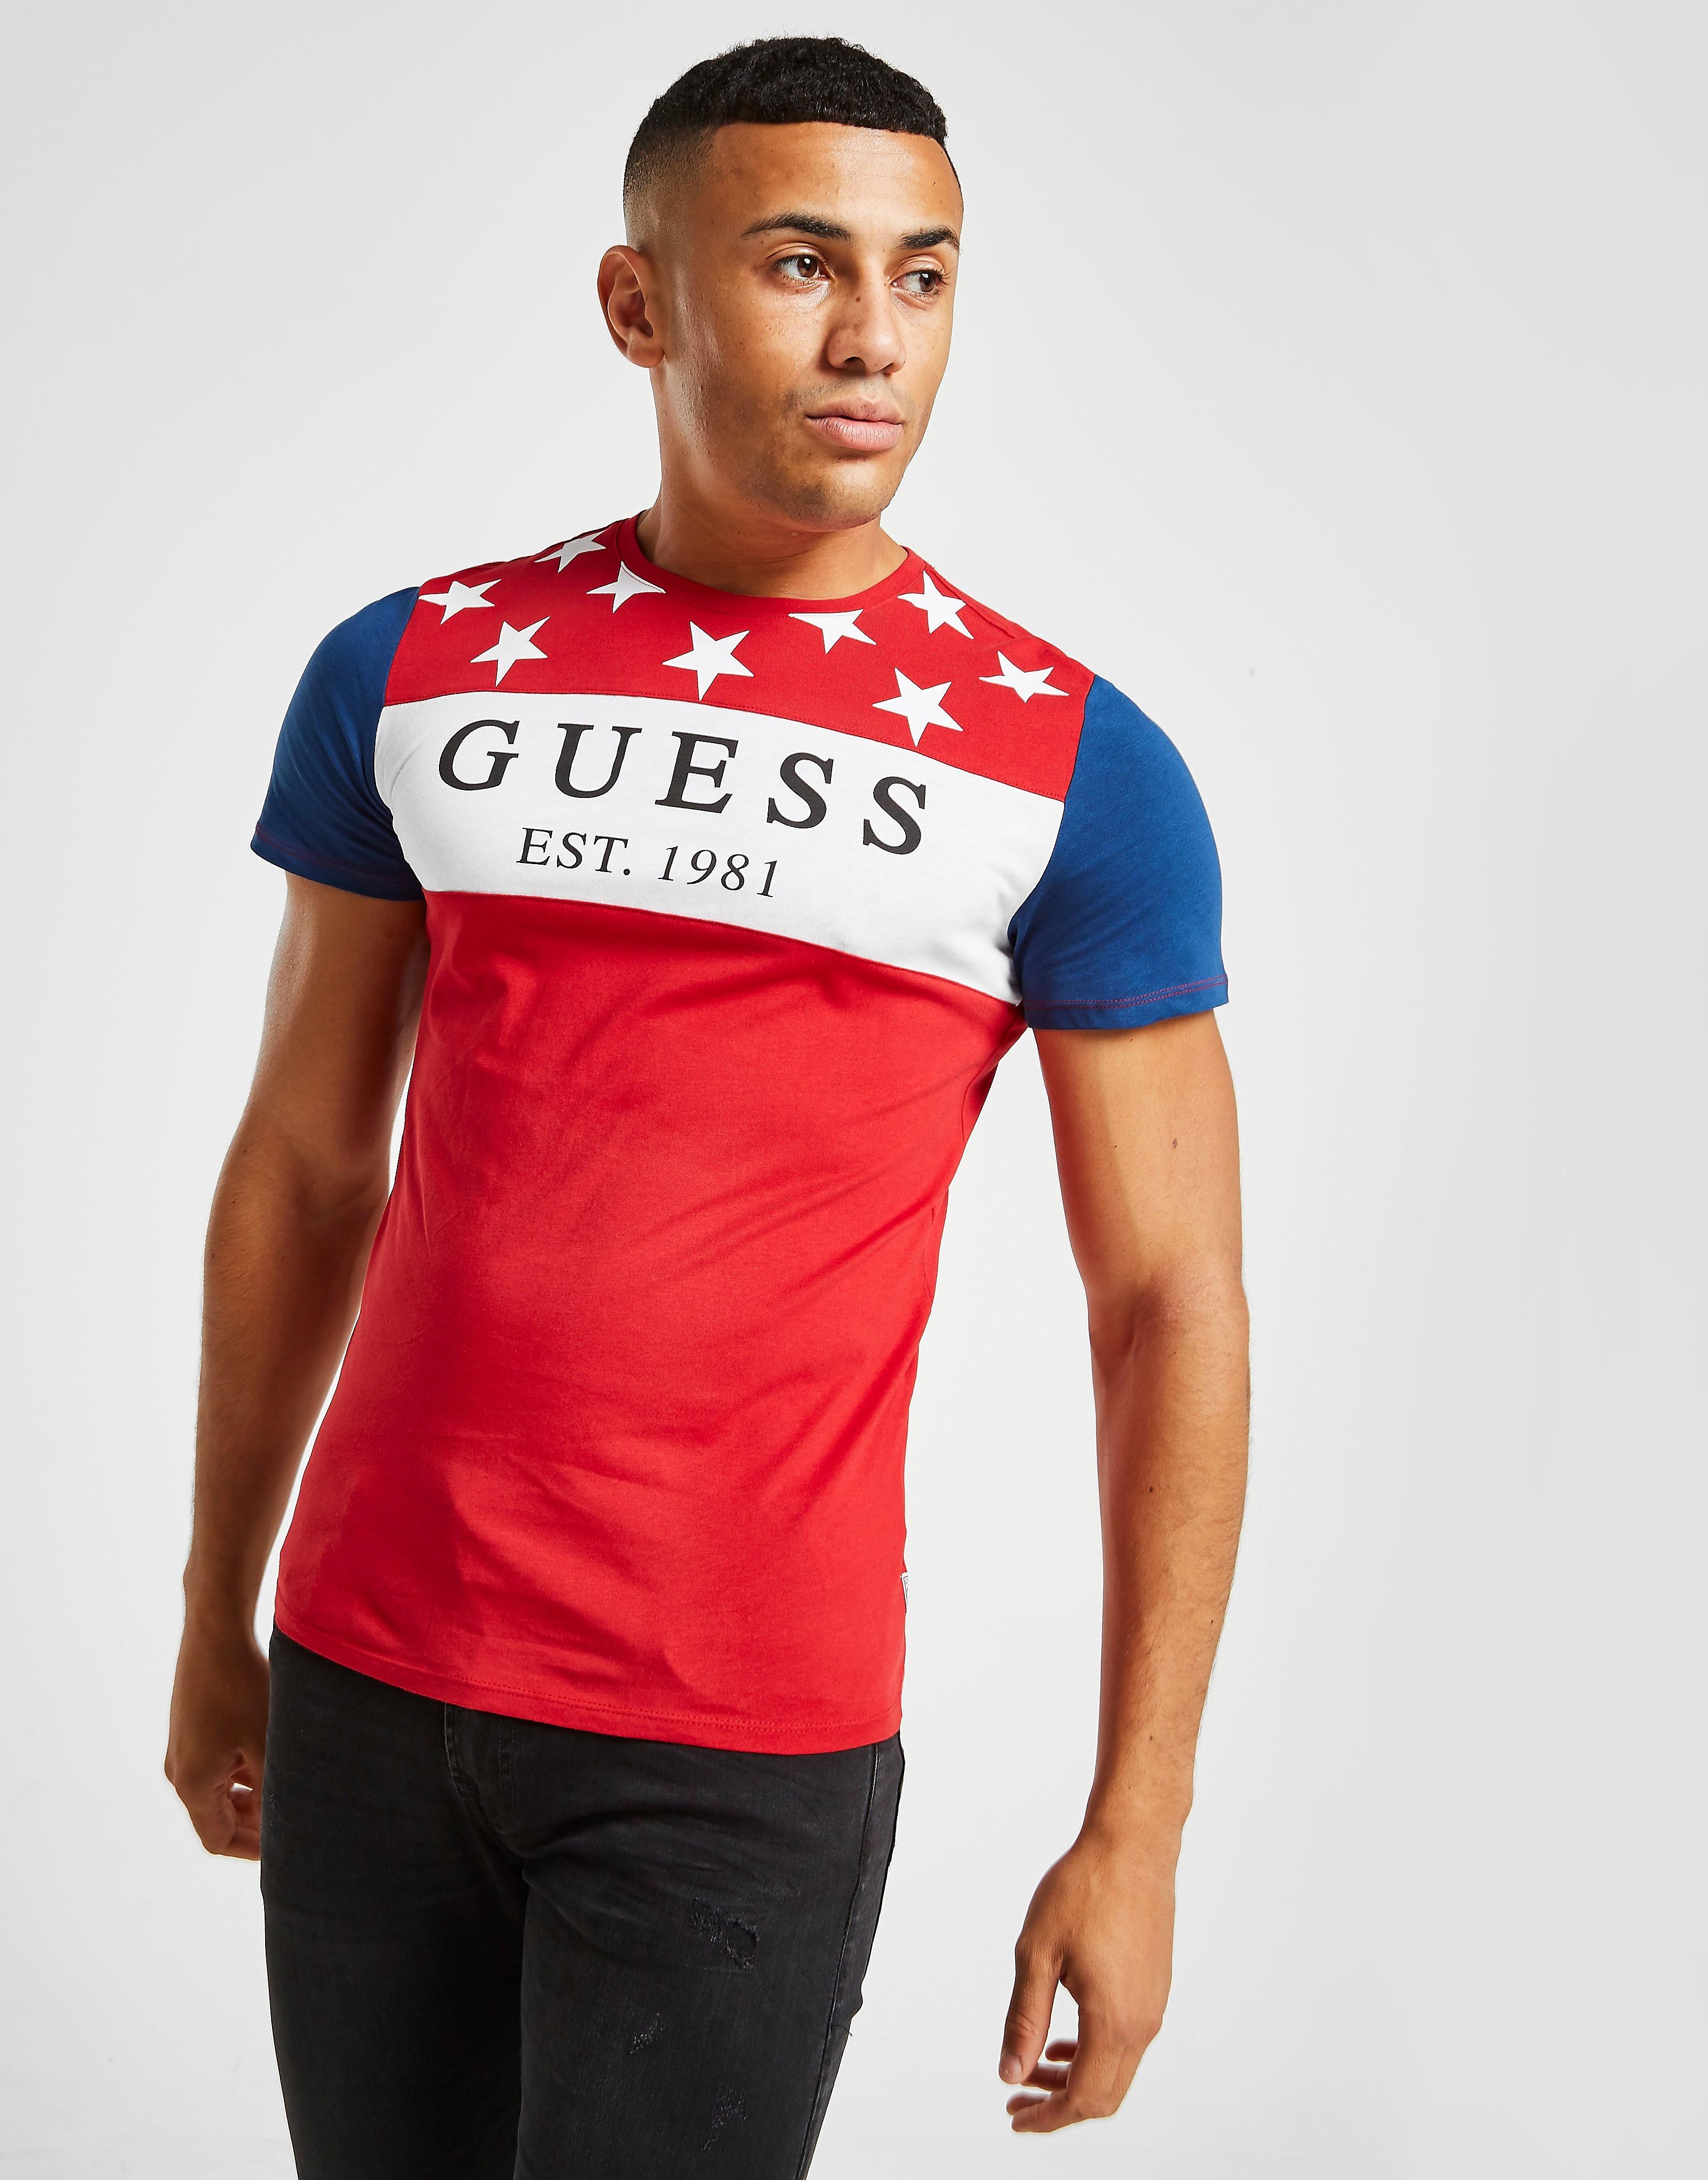 Guess T-Shirt Stars & Stripes Colour Block Homme - Rouge, Rouge